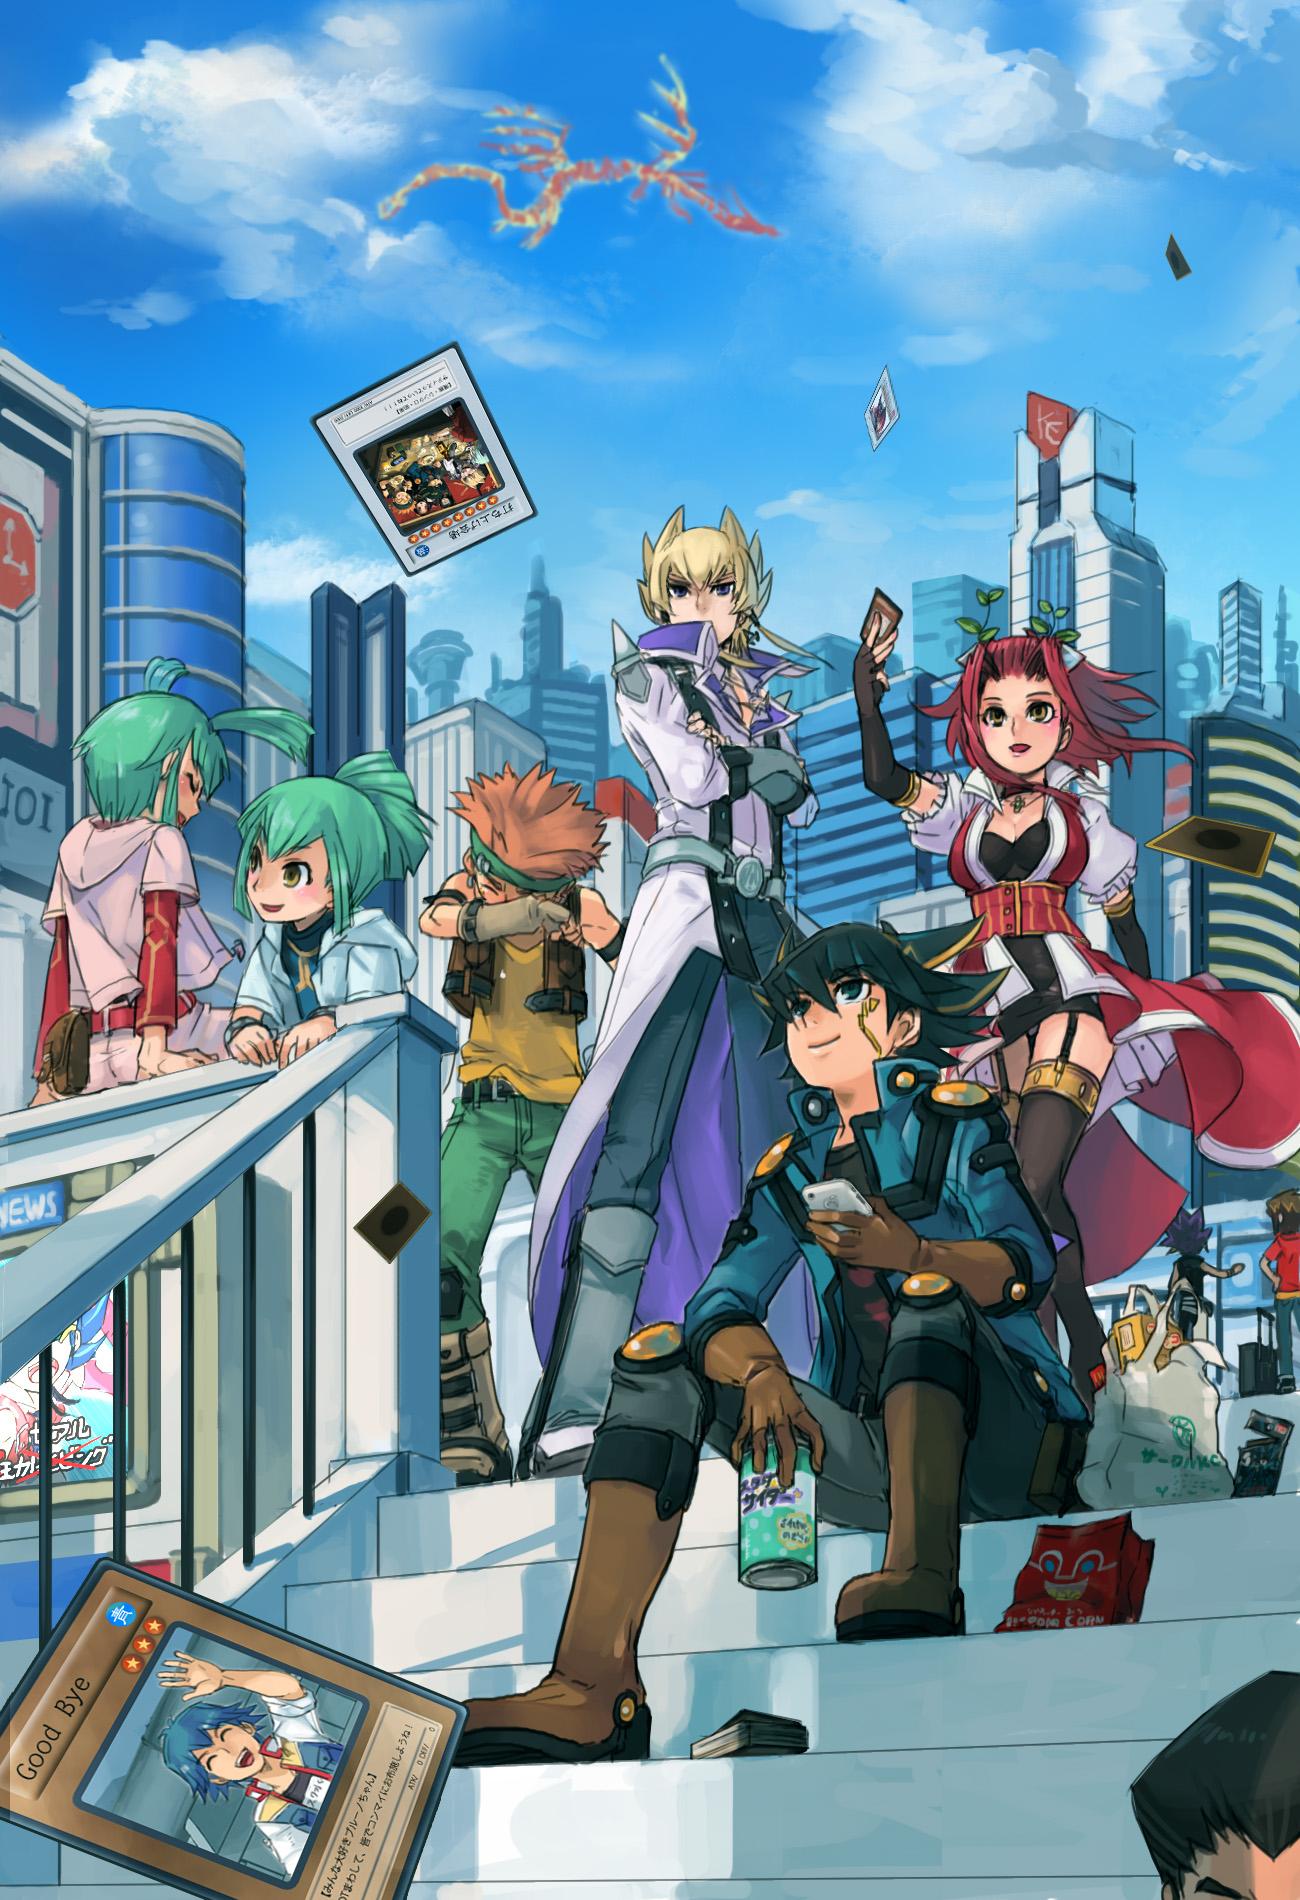 Yu Gi Oh Gx Mobile Wallpaper Zerochan Anime Image Board